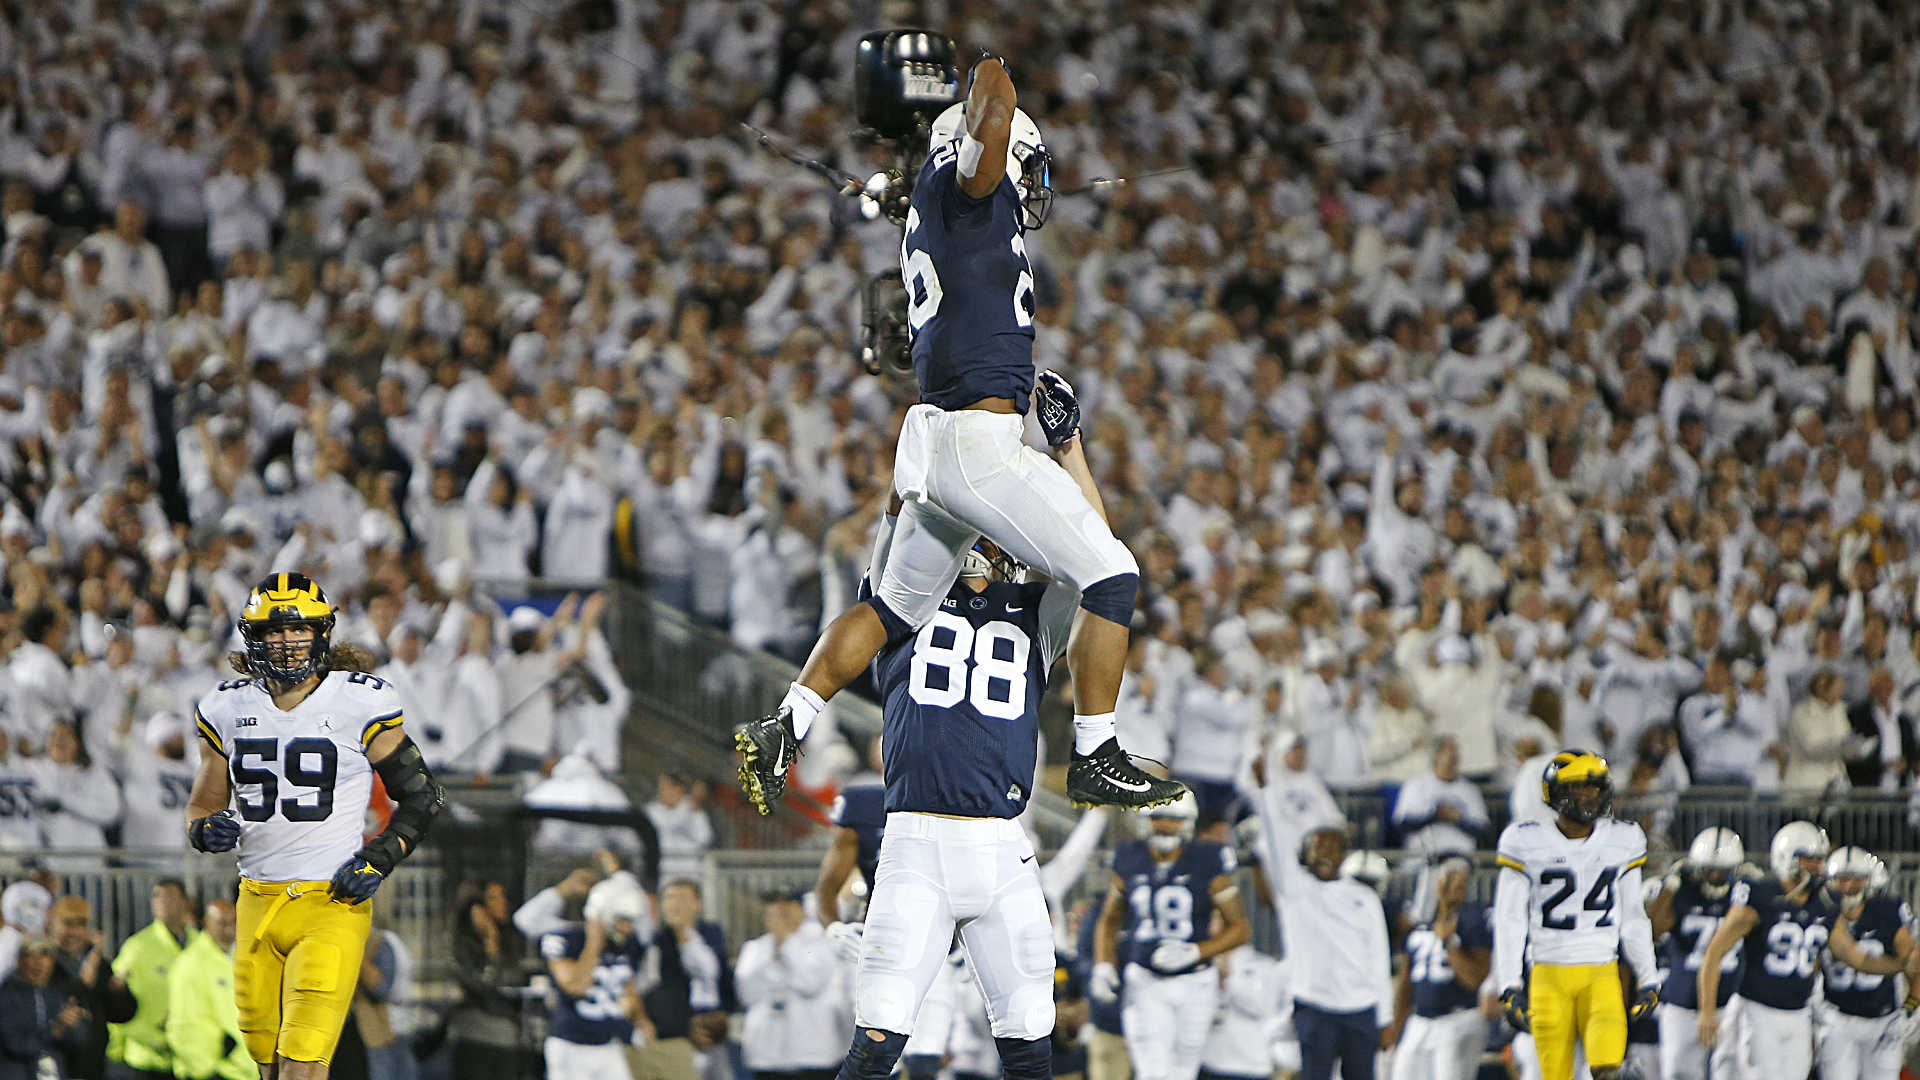 Saquon Barkley, college football's most outstanding player, deserves Heisman Trophy